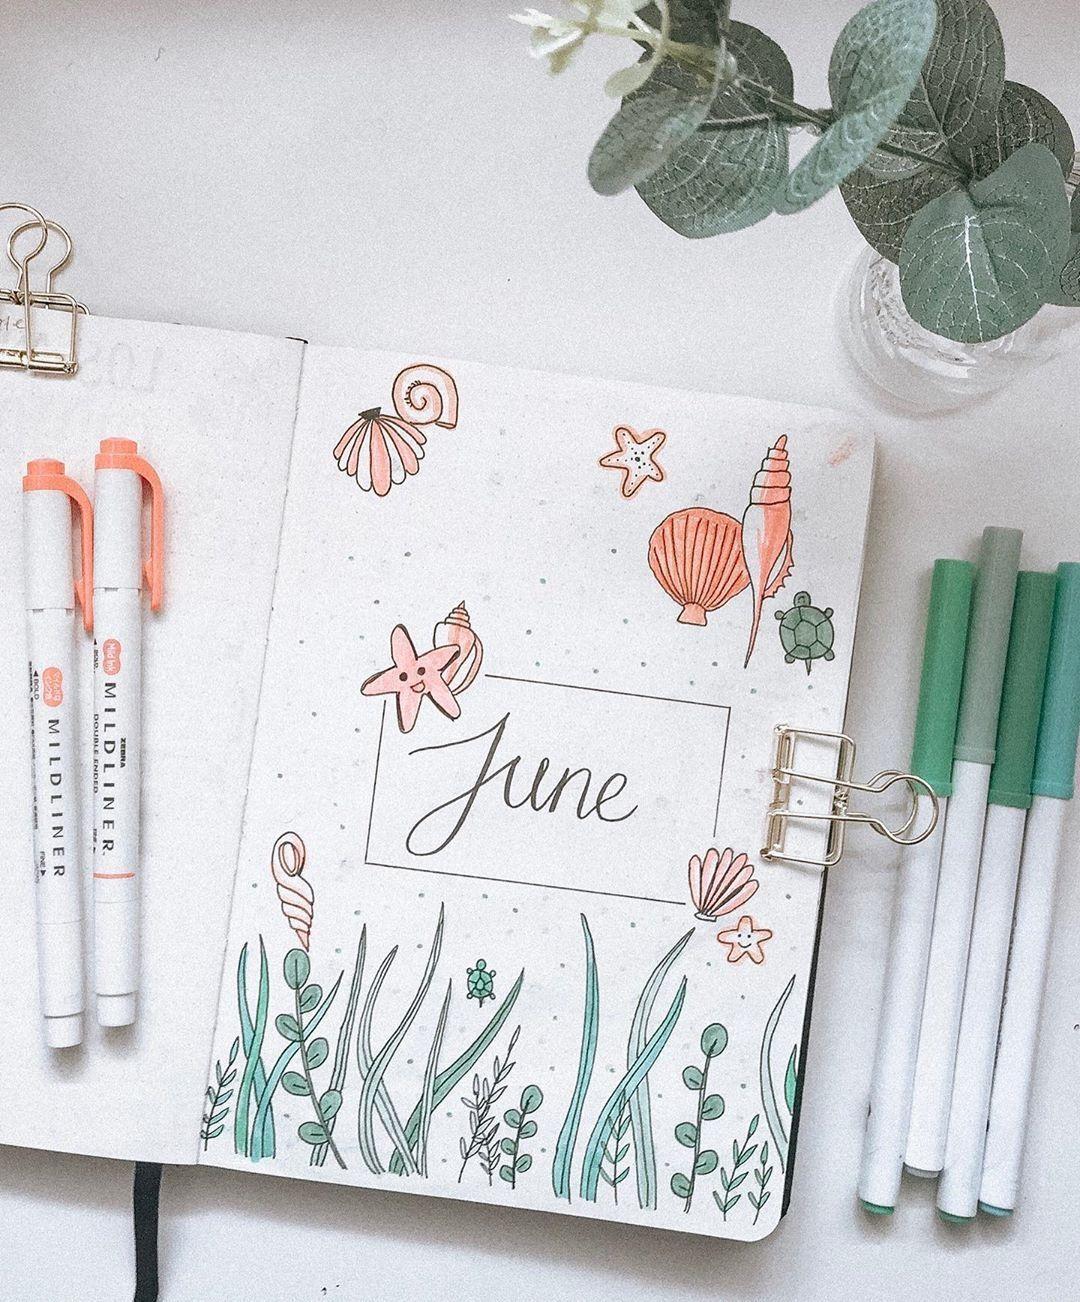 Summer Bullet Journal Cover Page Ideas | Heraldeecreates